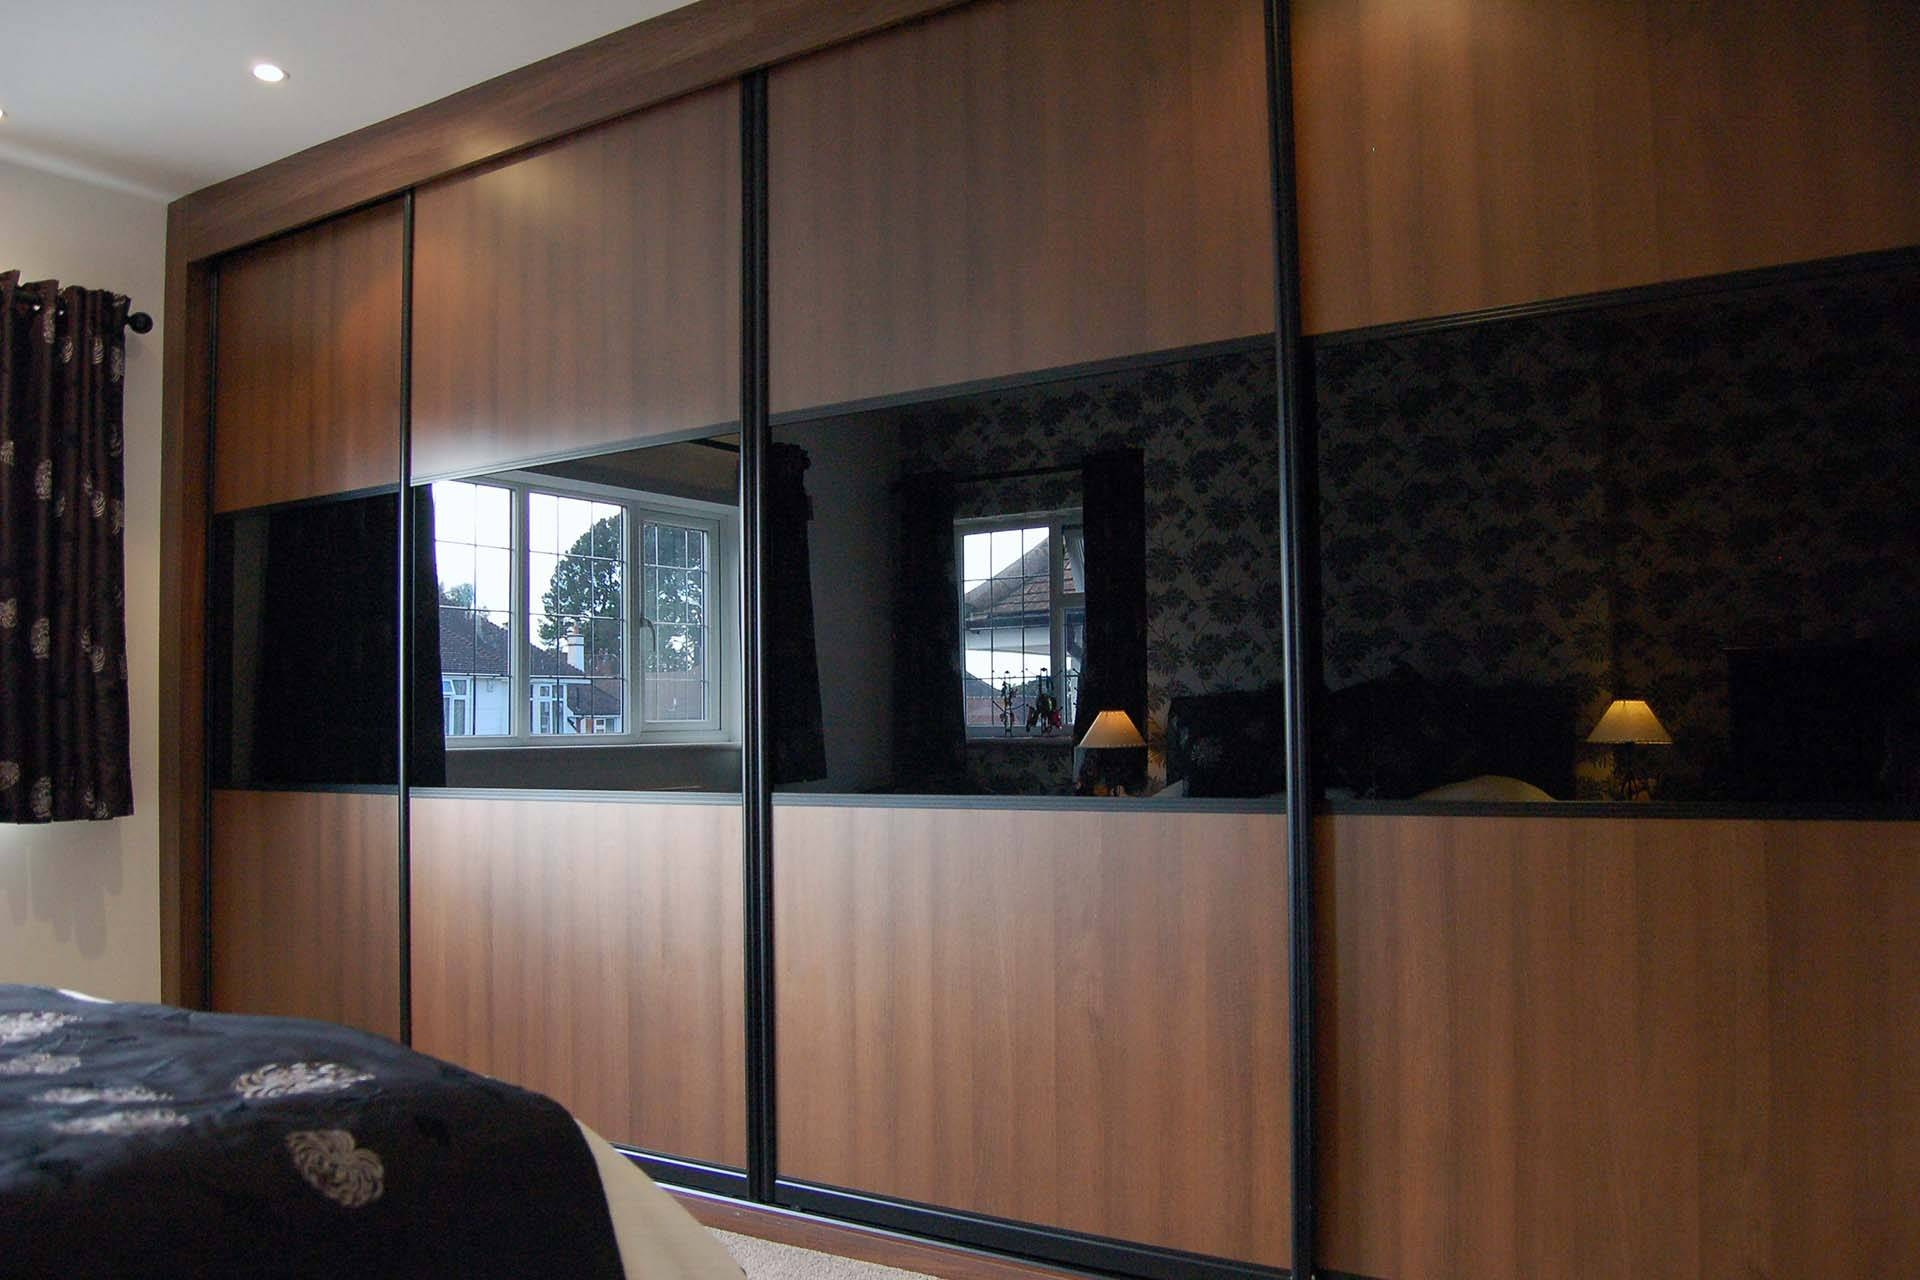 Design Your Own Sliding Wardrobe Doors Online – Custom World Bedrooms In Black Wood Wardrobes (View 2 of 15)